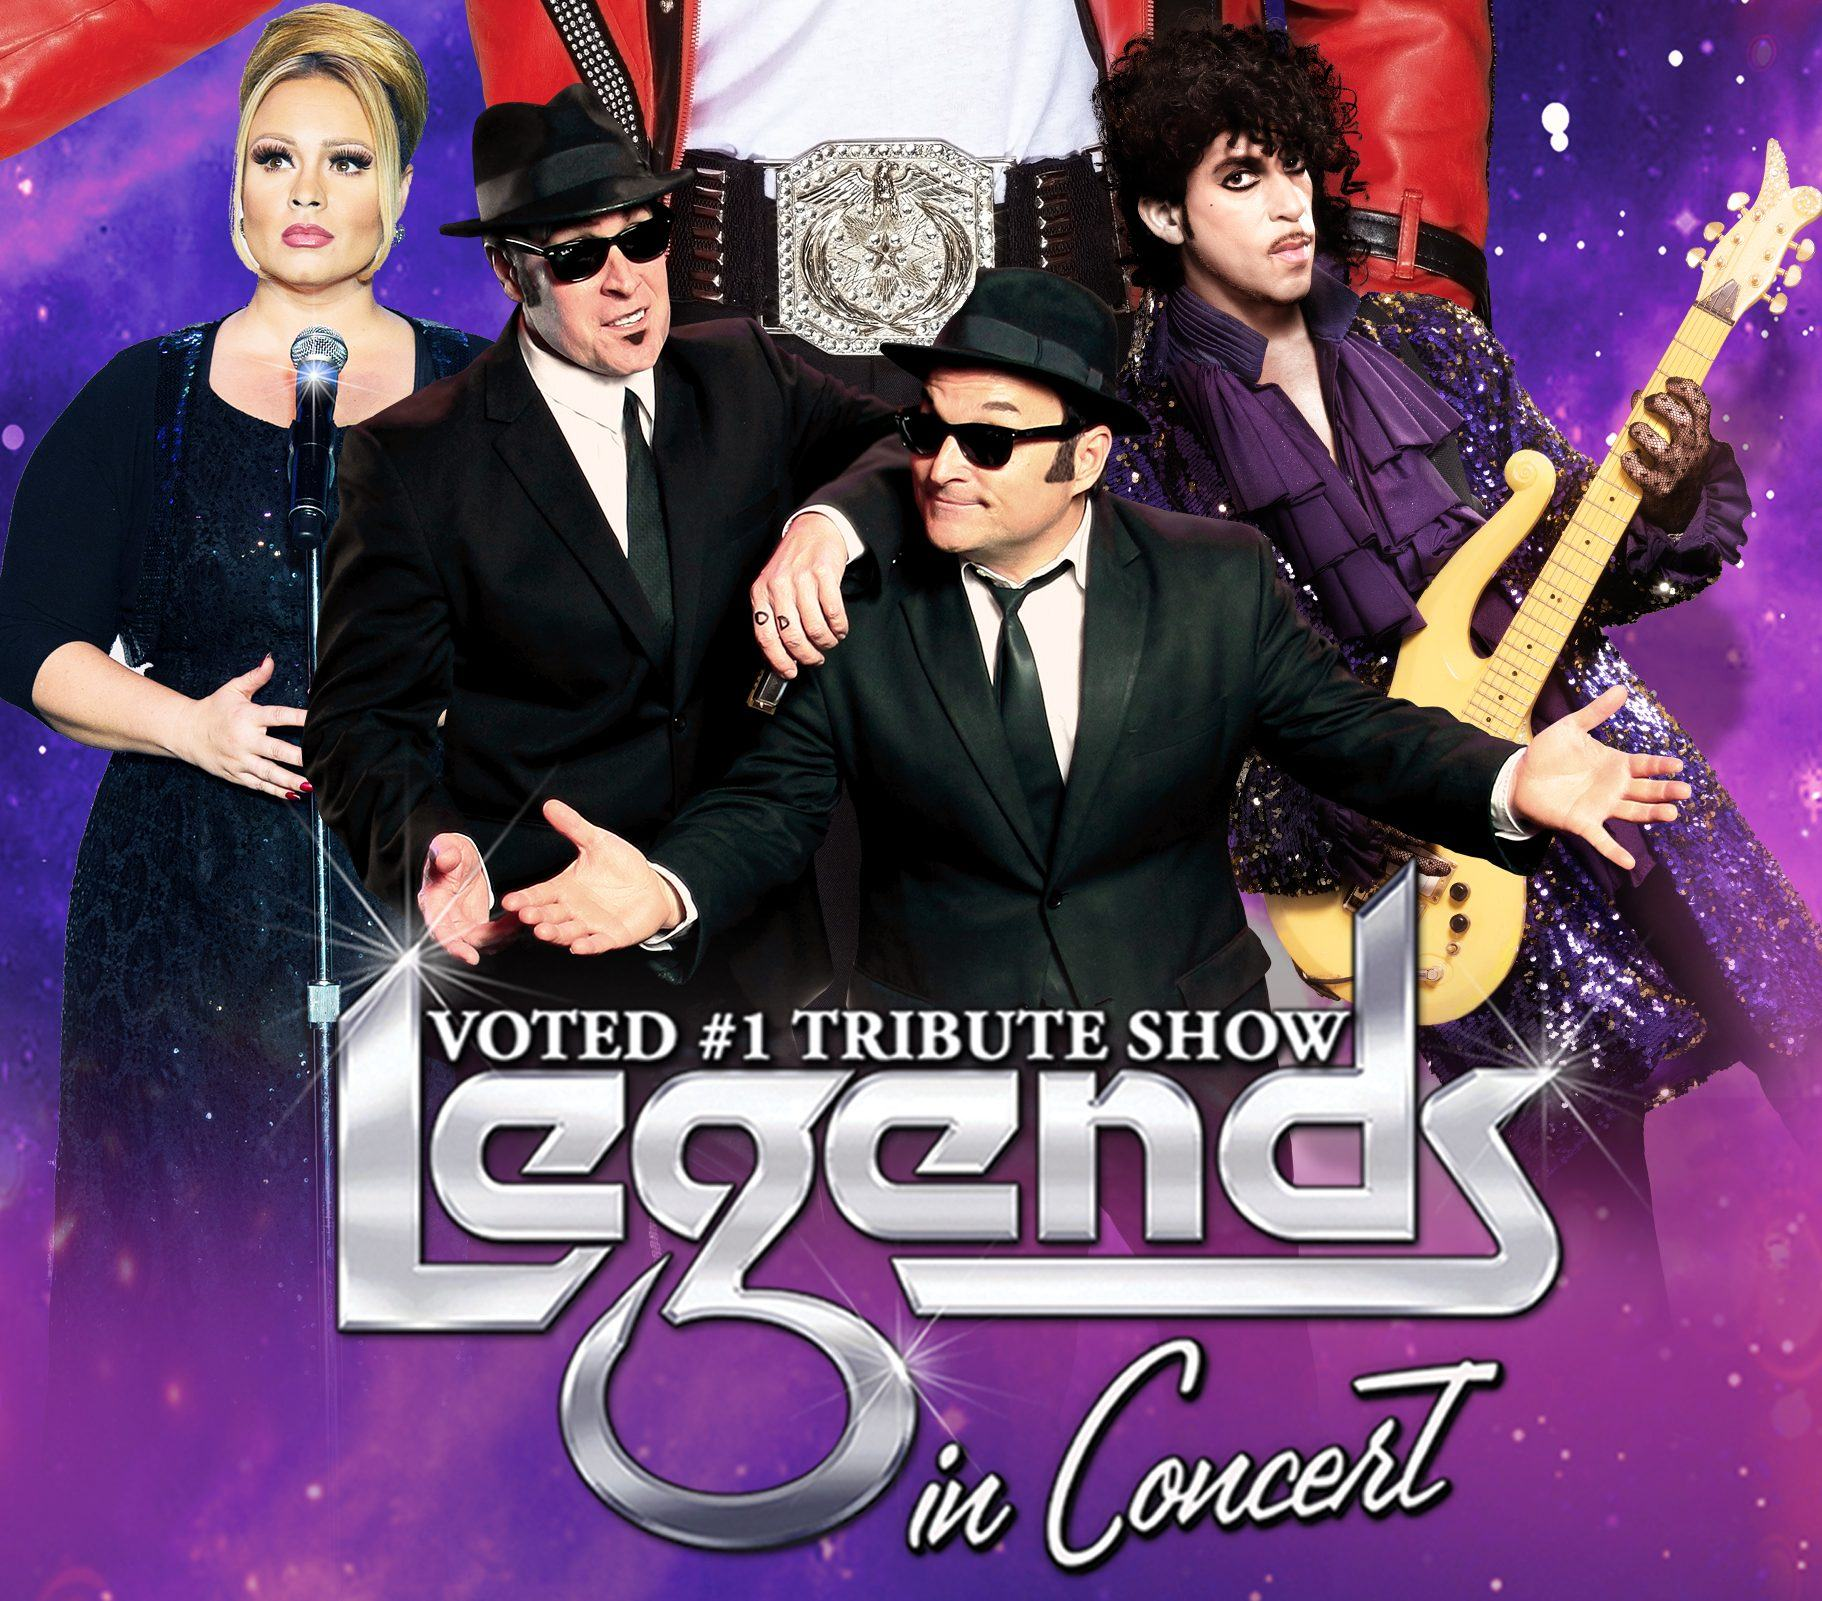 vegas legends in concert review